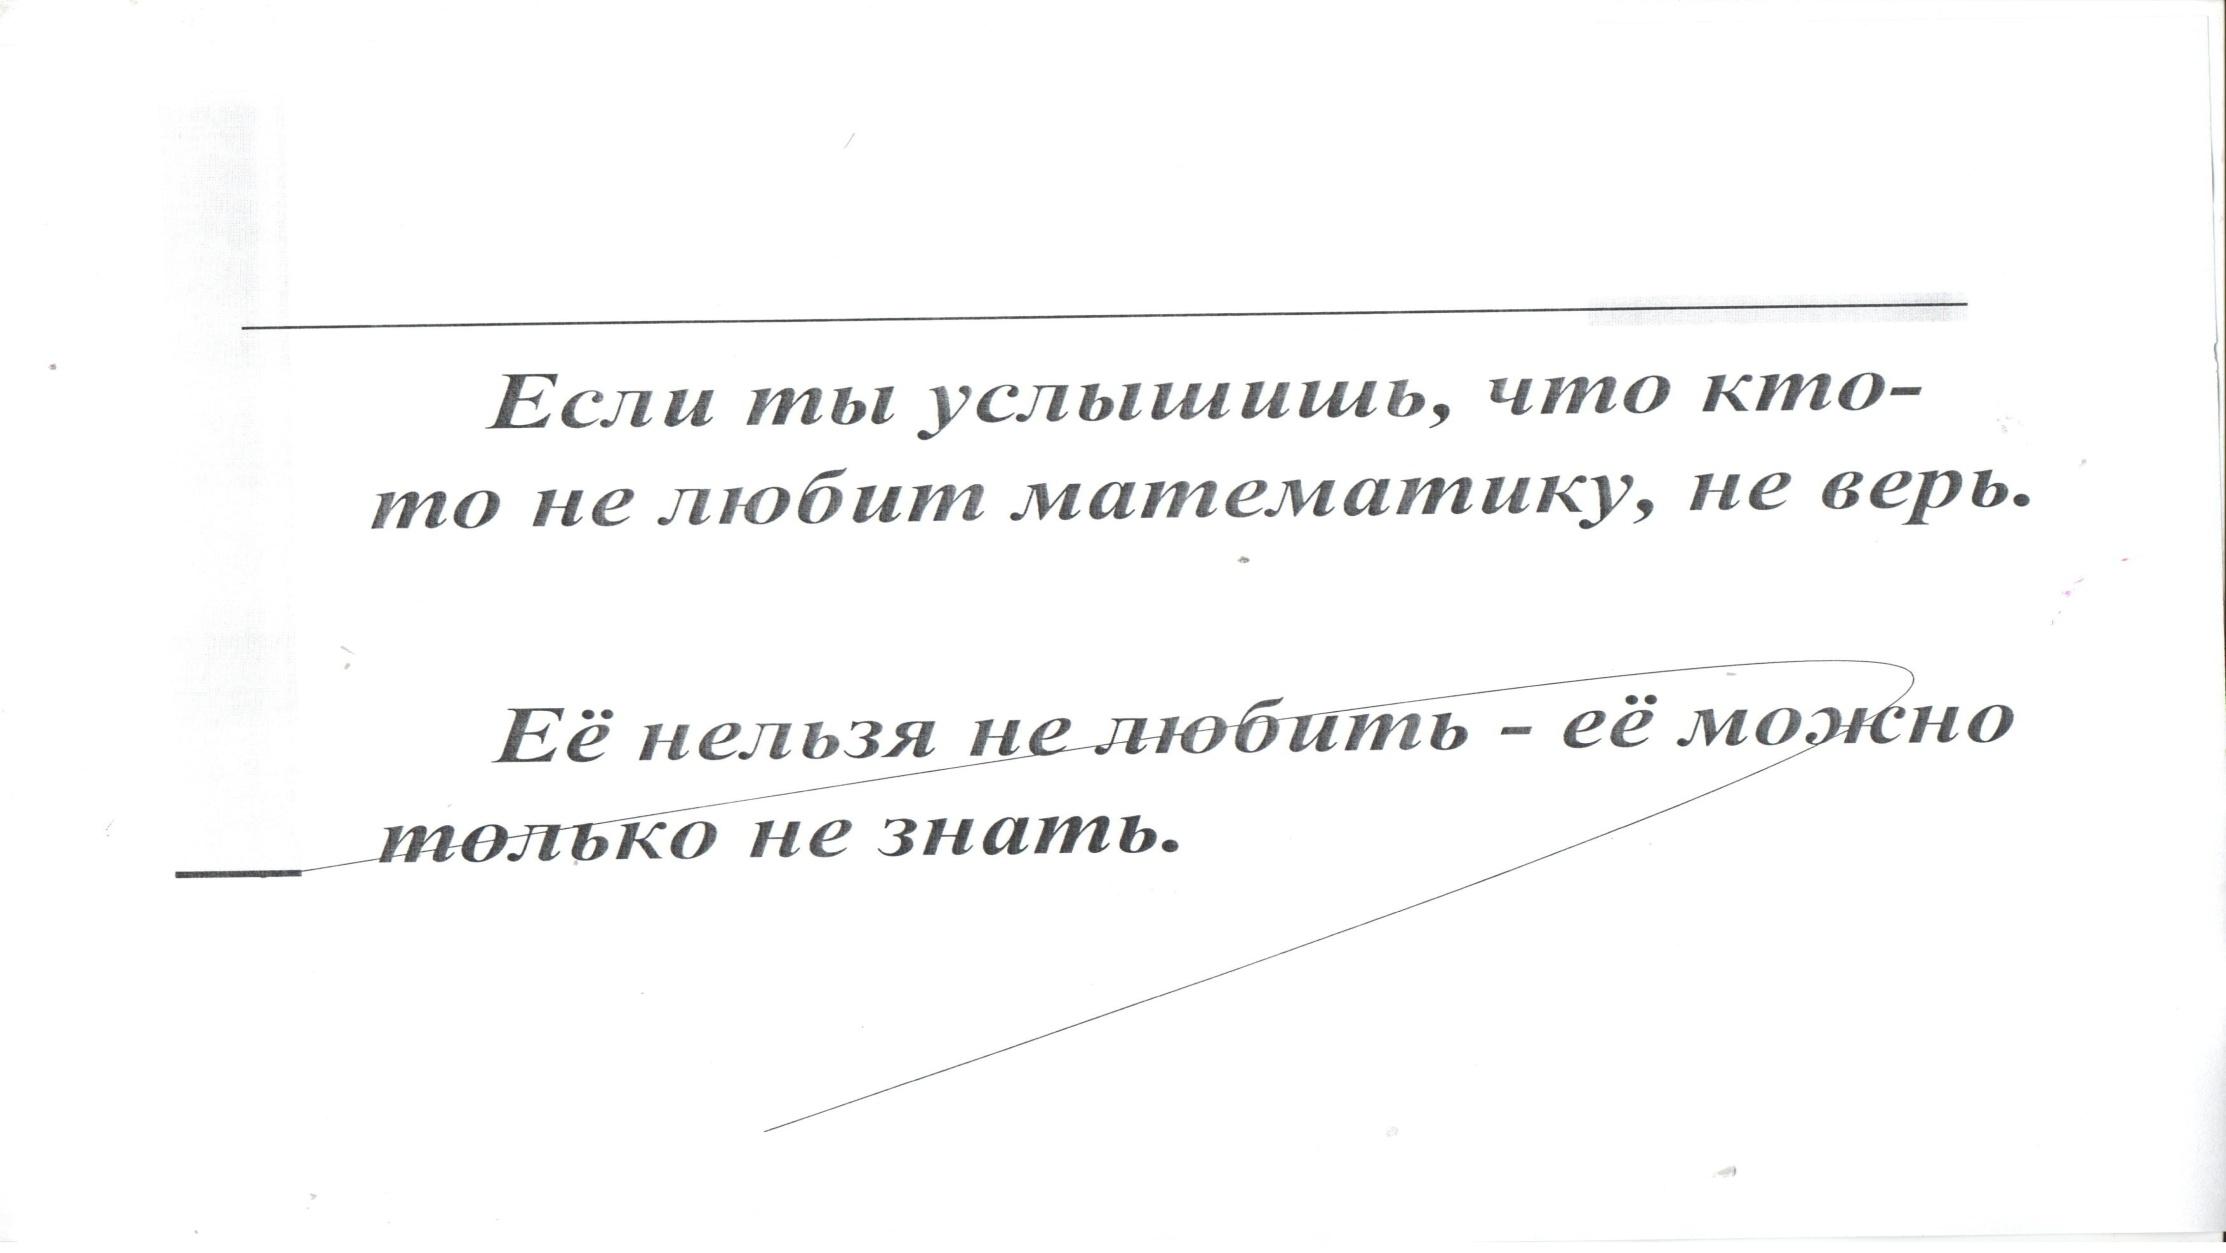 C:\Documents and Settings\Школа\Мои документы\Мои рисунки\Изображение\Изображение 019.jpg